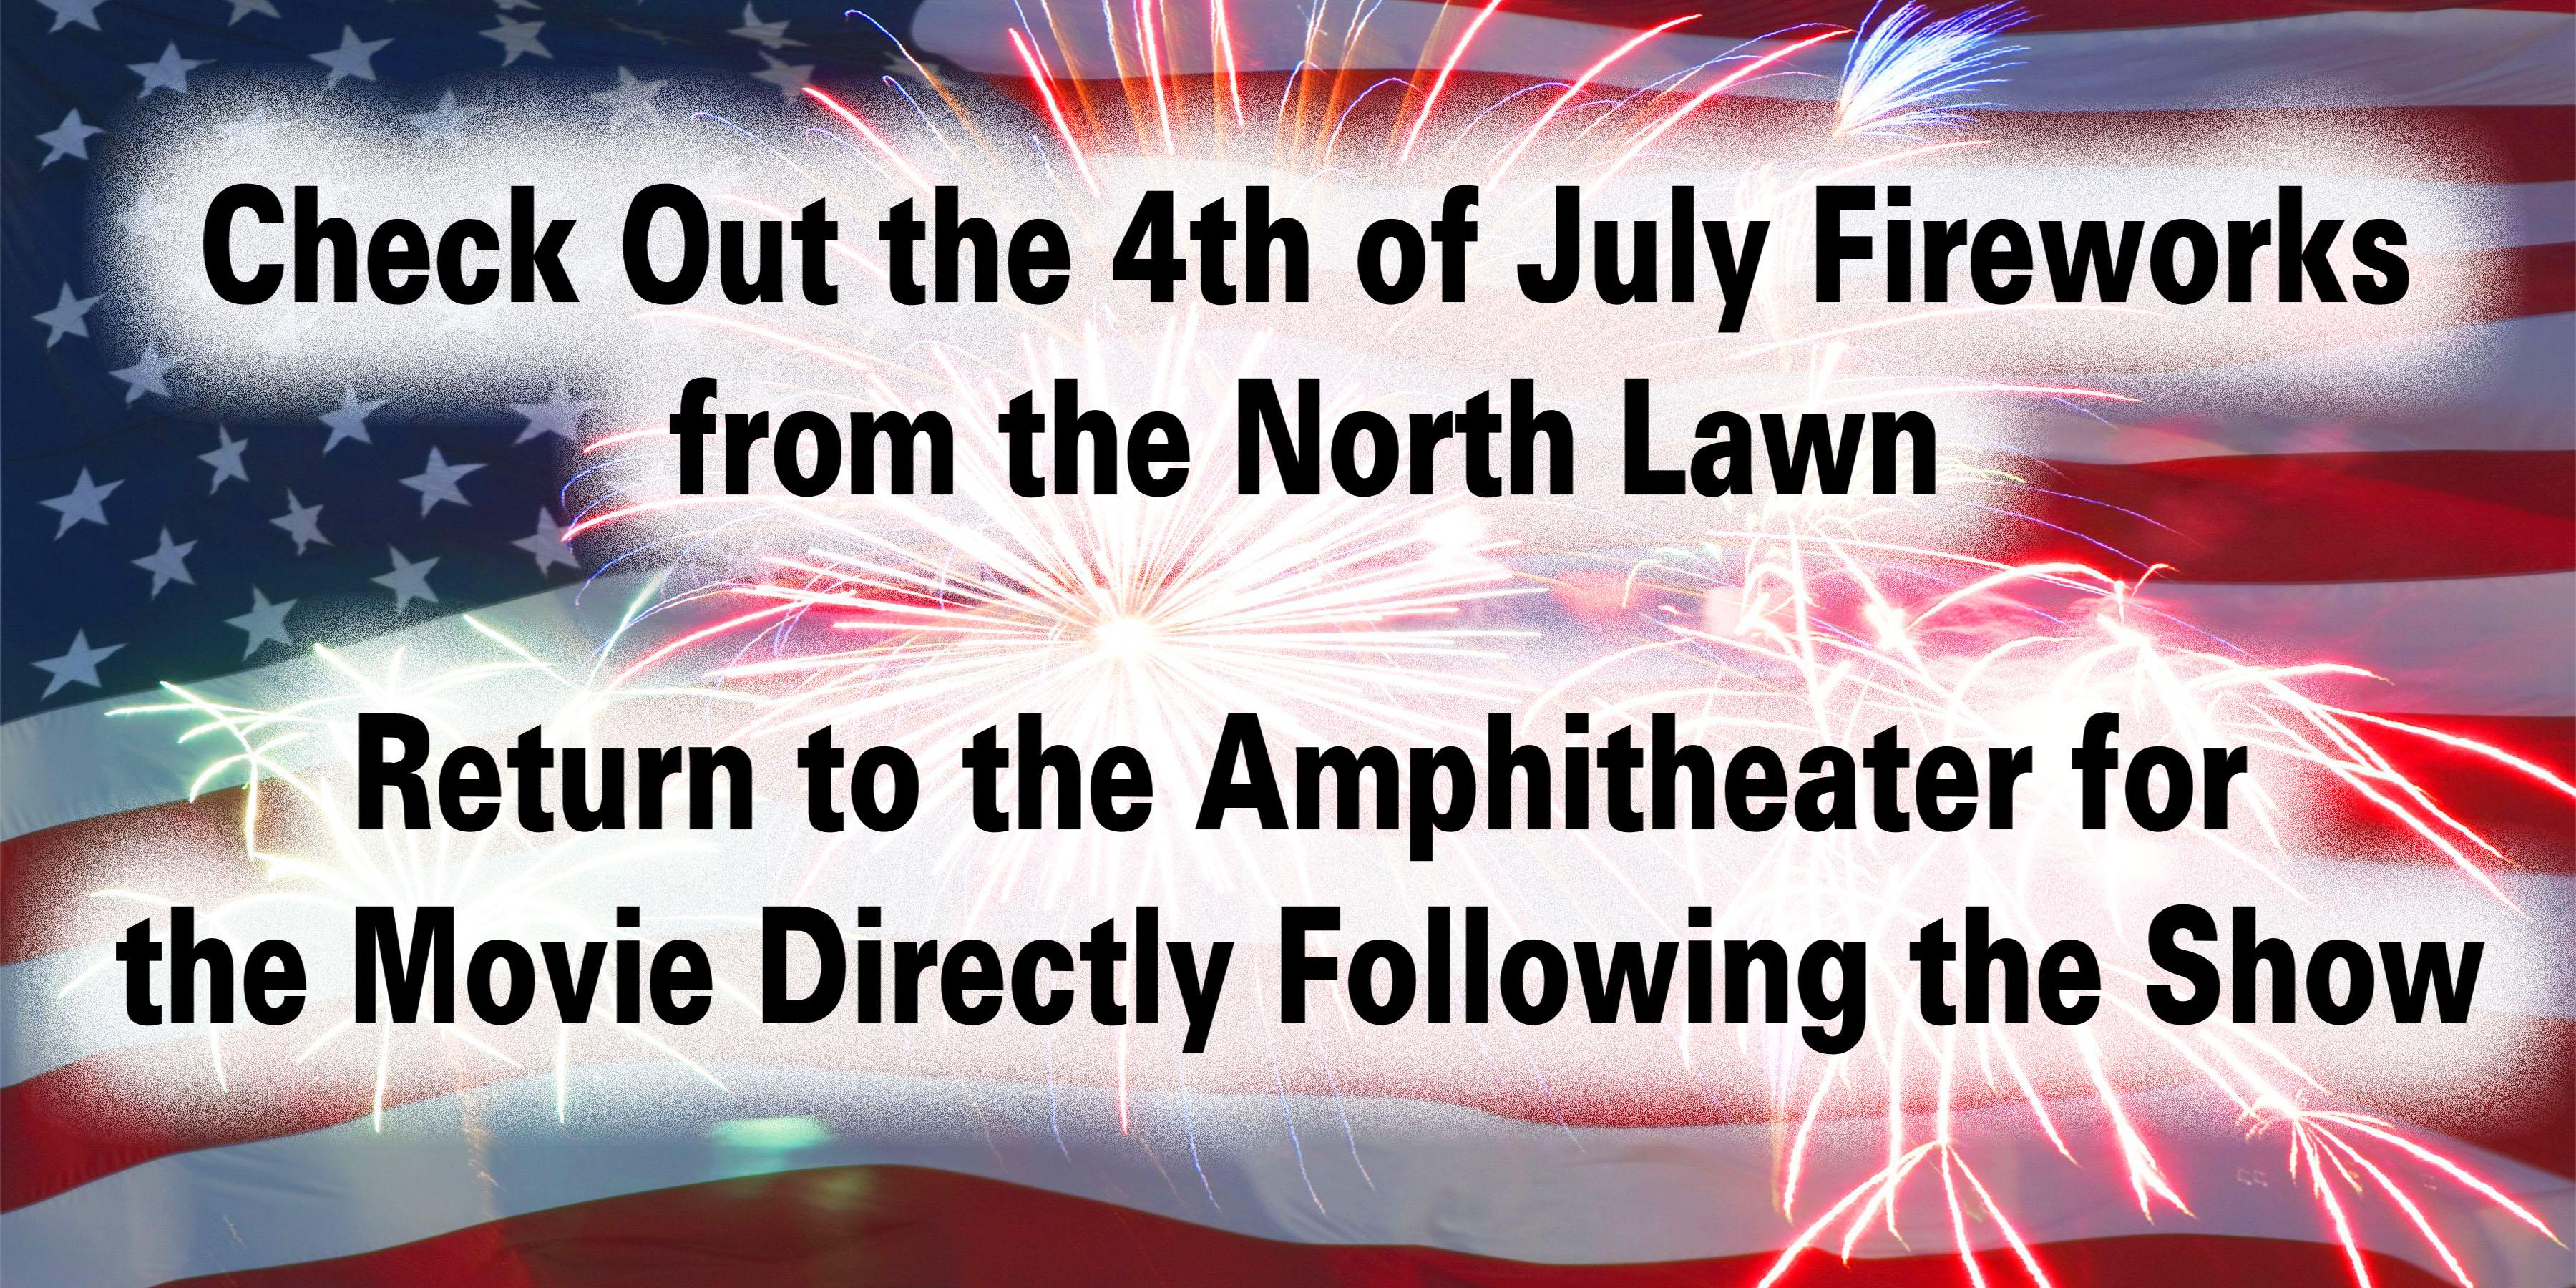 http://www.chamberorganizer.com/maricopachamber/docs/Flag_Fireworks_Banner2.jpg